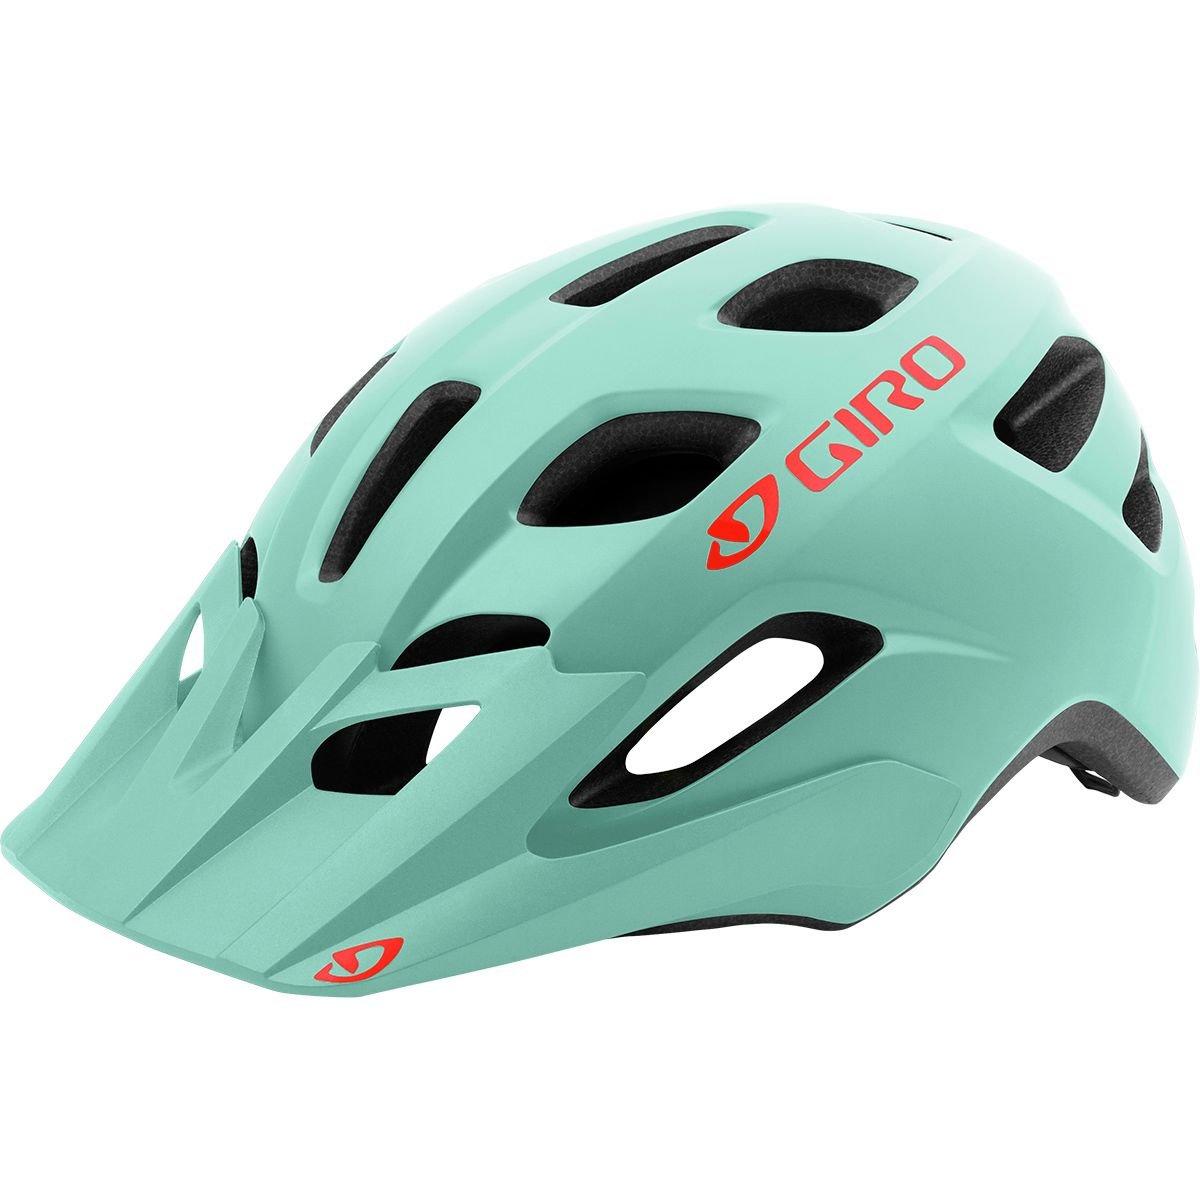 Giro Fixture MIPS Bike Helmet - Matte Frost by Giro